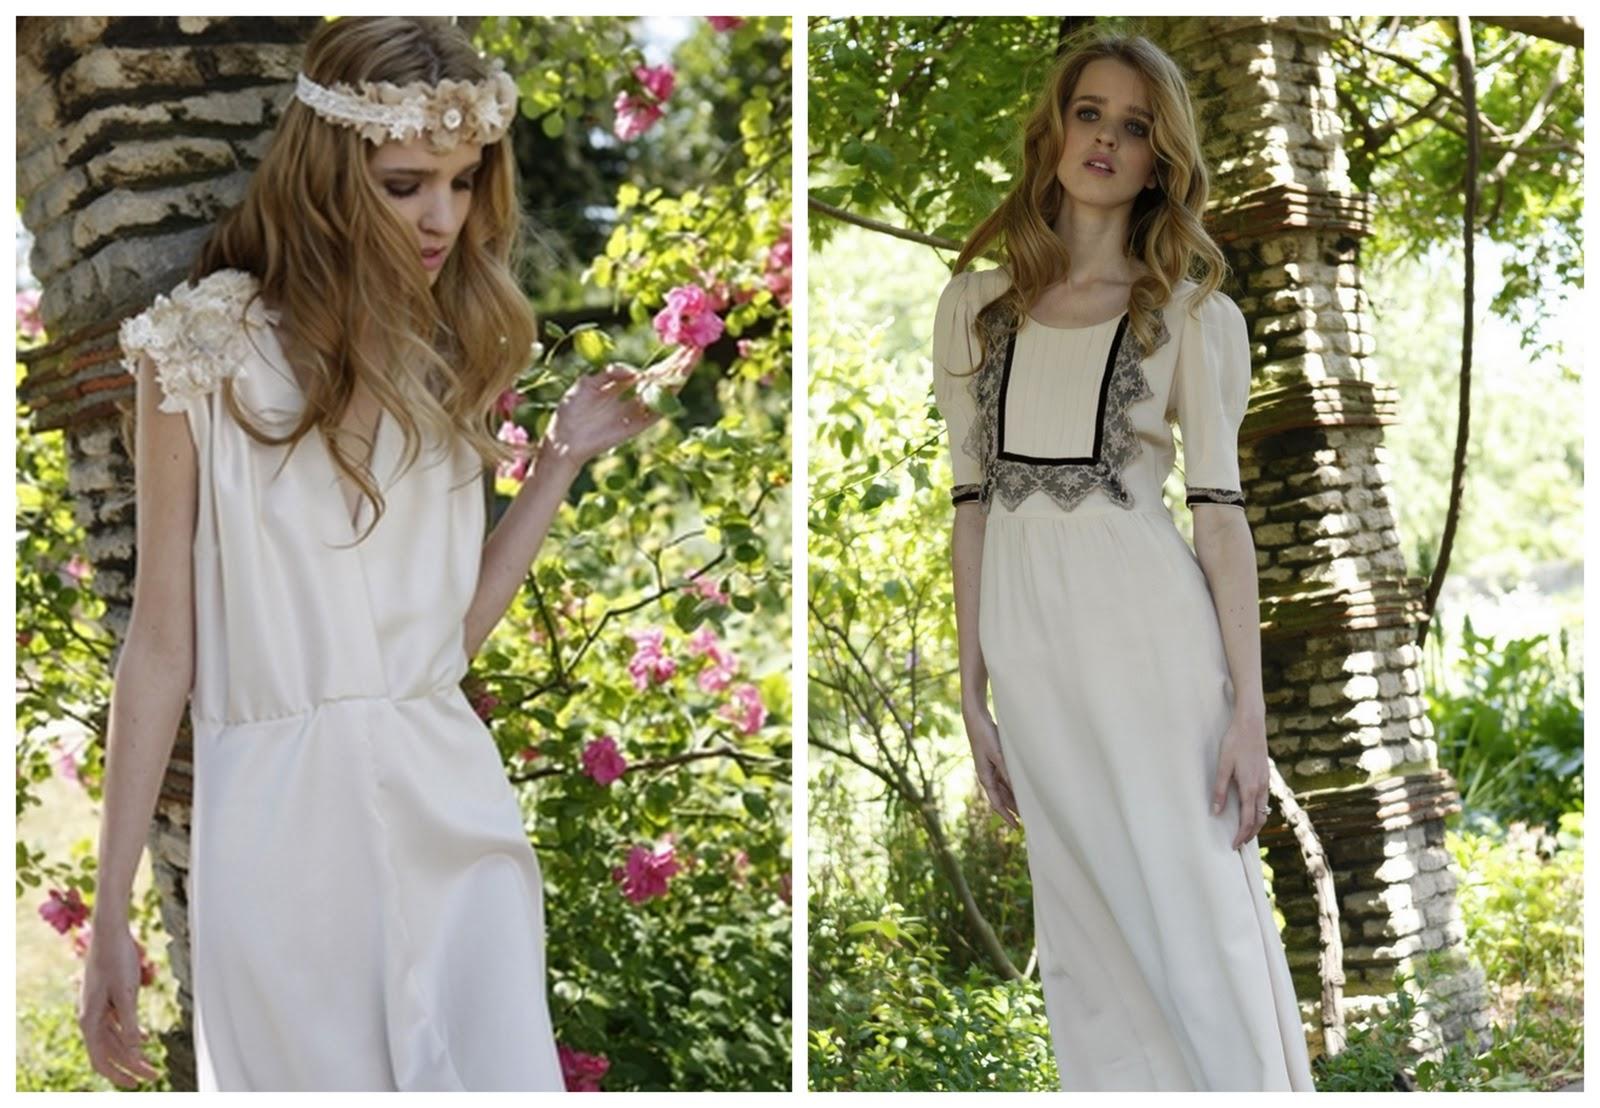 Reasonably Priced Vintage Boho Wedding Dresses From Minna